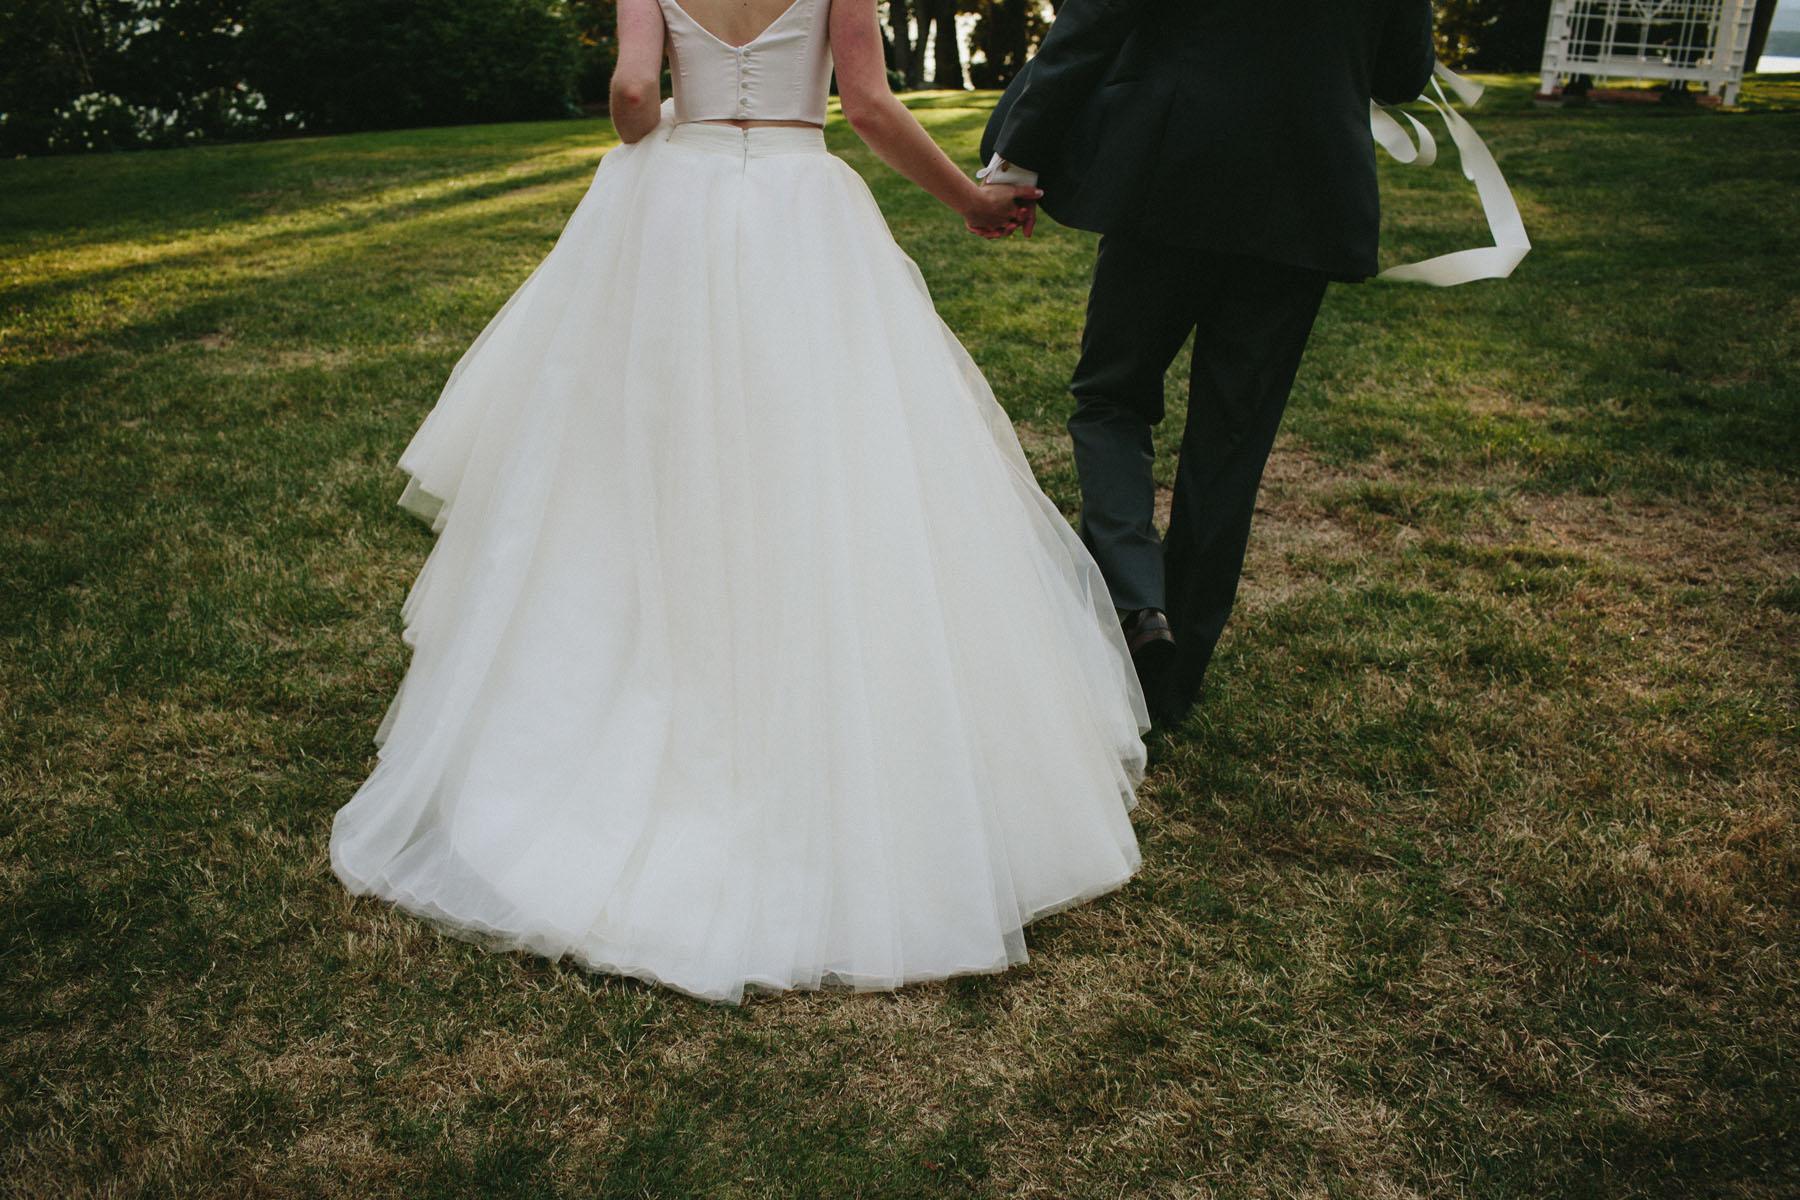 thetis-island-wedding-photographer-rp-rn-132.jpg